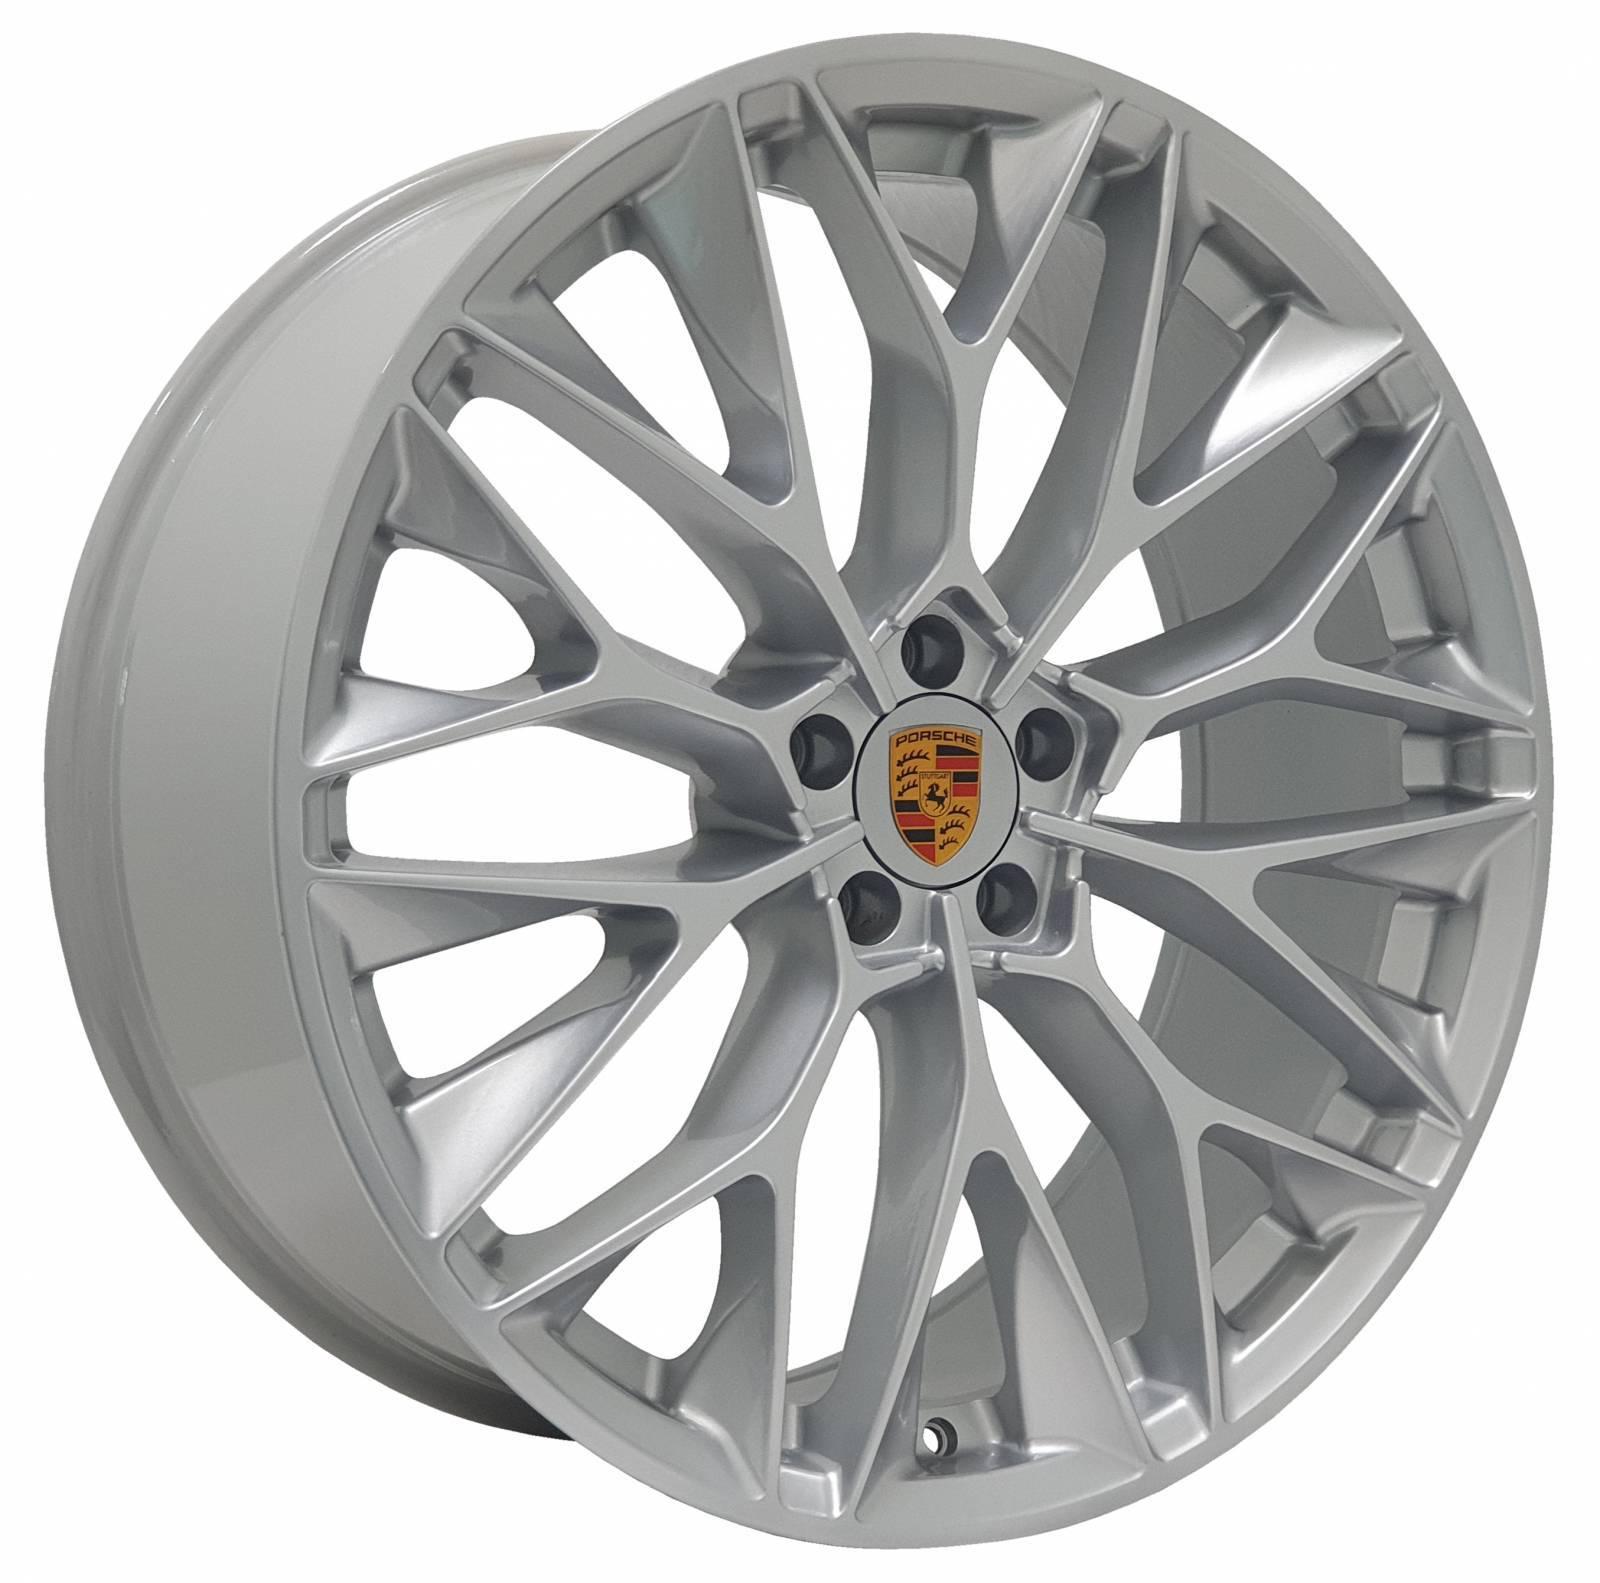 Jogo Rodas Porsche P-200 ZWPC1 22X90 5X113 ET:40 CB:72 Hyper Prata